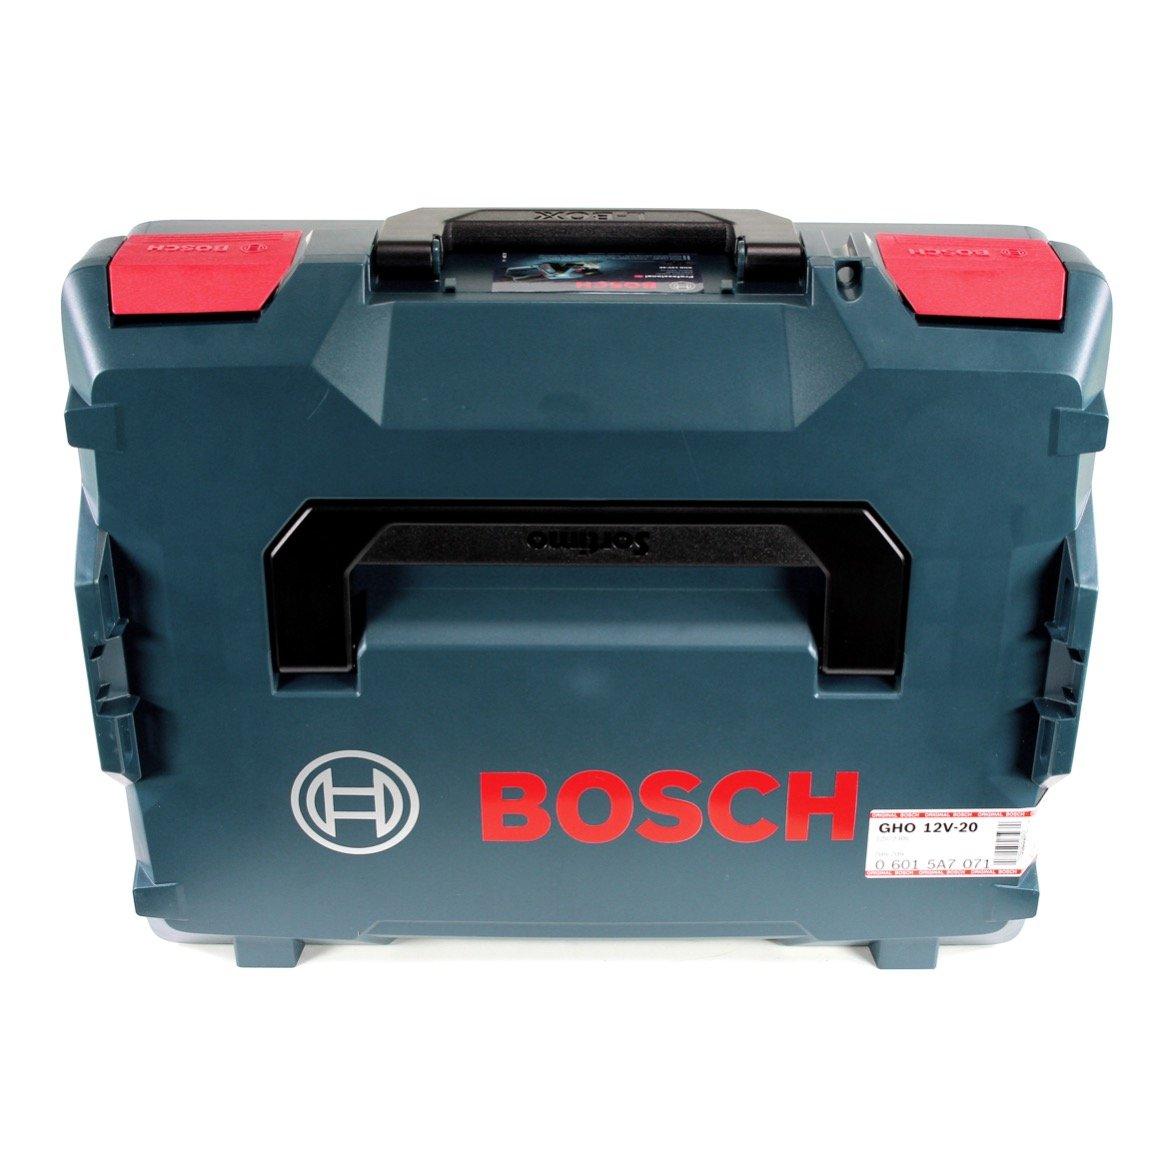 1x GBA 12 V 3,0 Ah Akku Bosch GHO 12V-20 Akku Hobel Professional in L-Boxx GAL 1230 CV Schnell Ladeger/ät